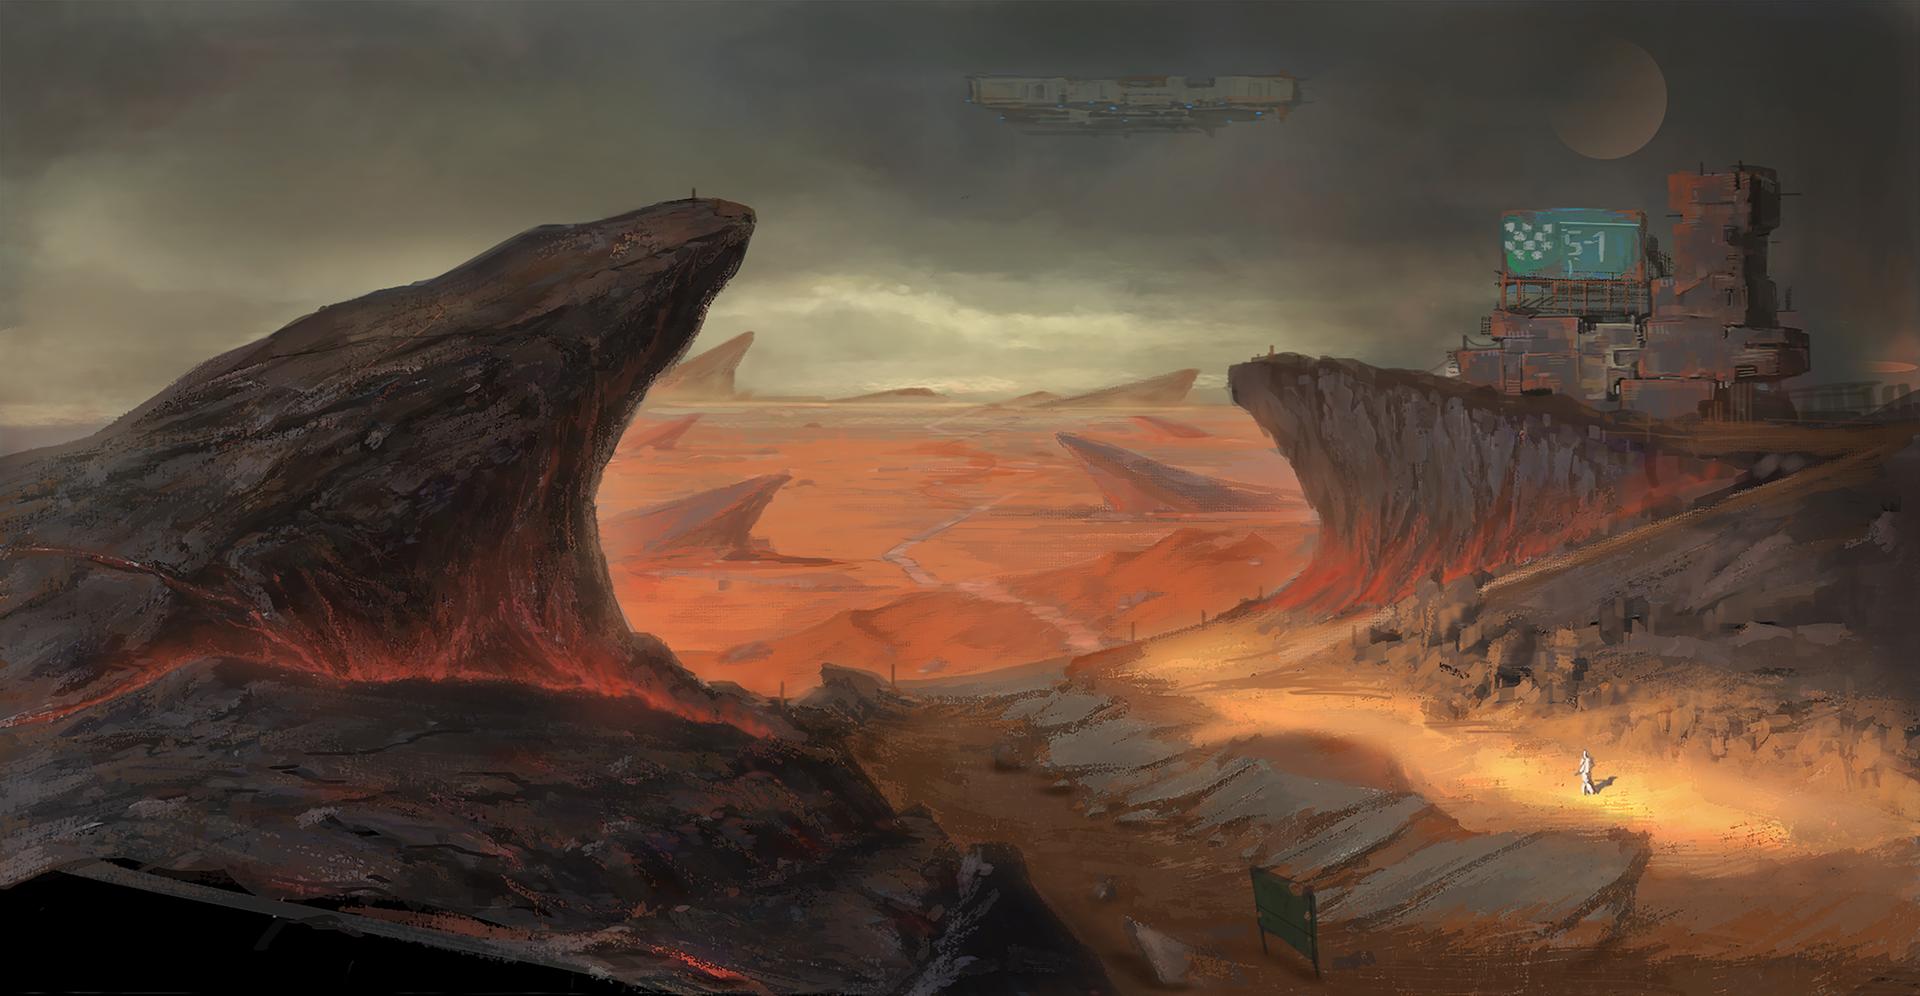 Black Mountain Desert Concept Art by Game Development student Weiyi Qin